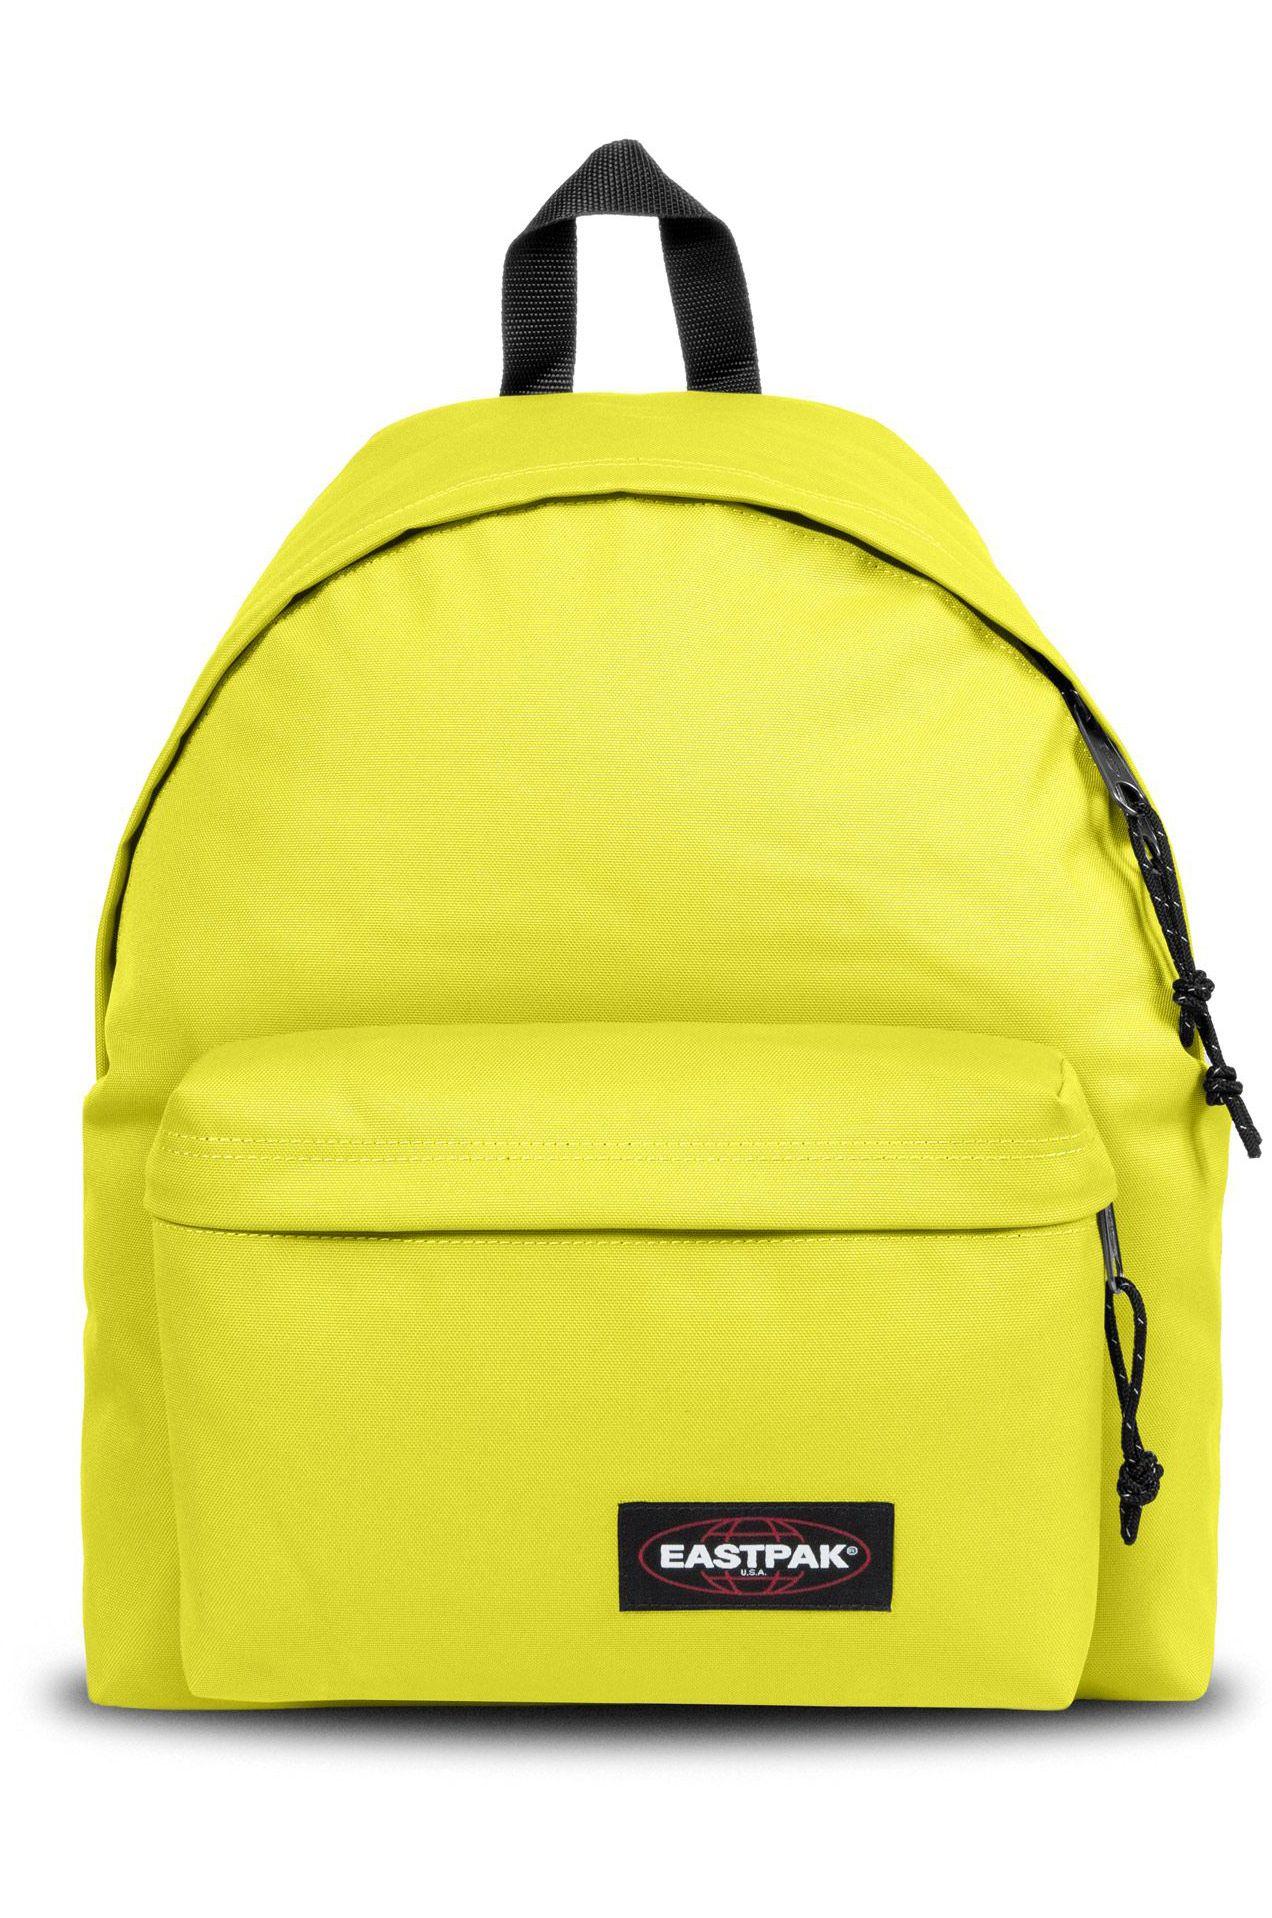 Eastpak Backpack PADDED PAK'R Spring Lime